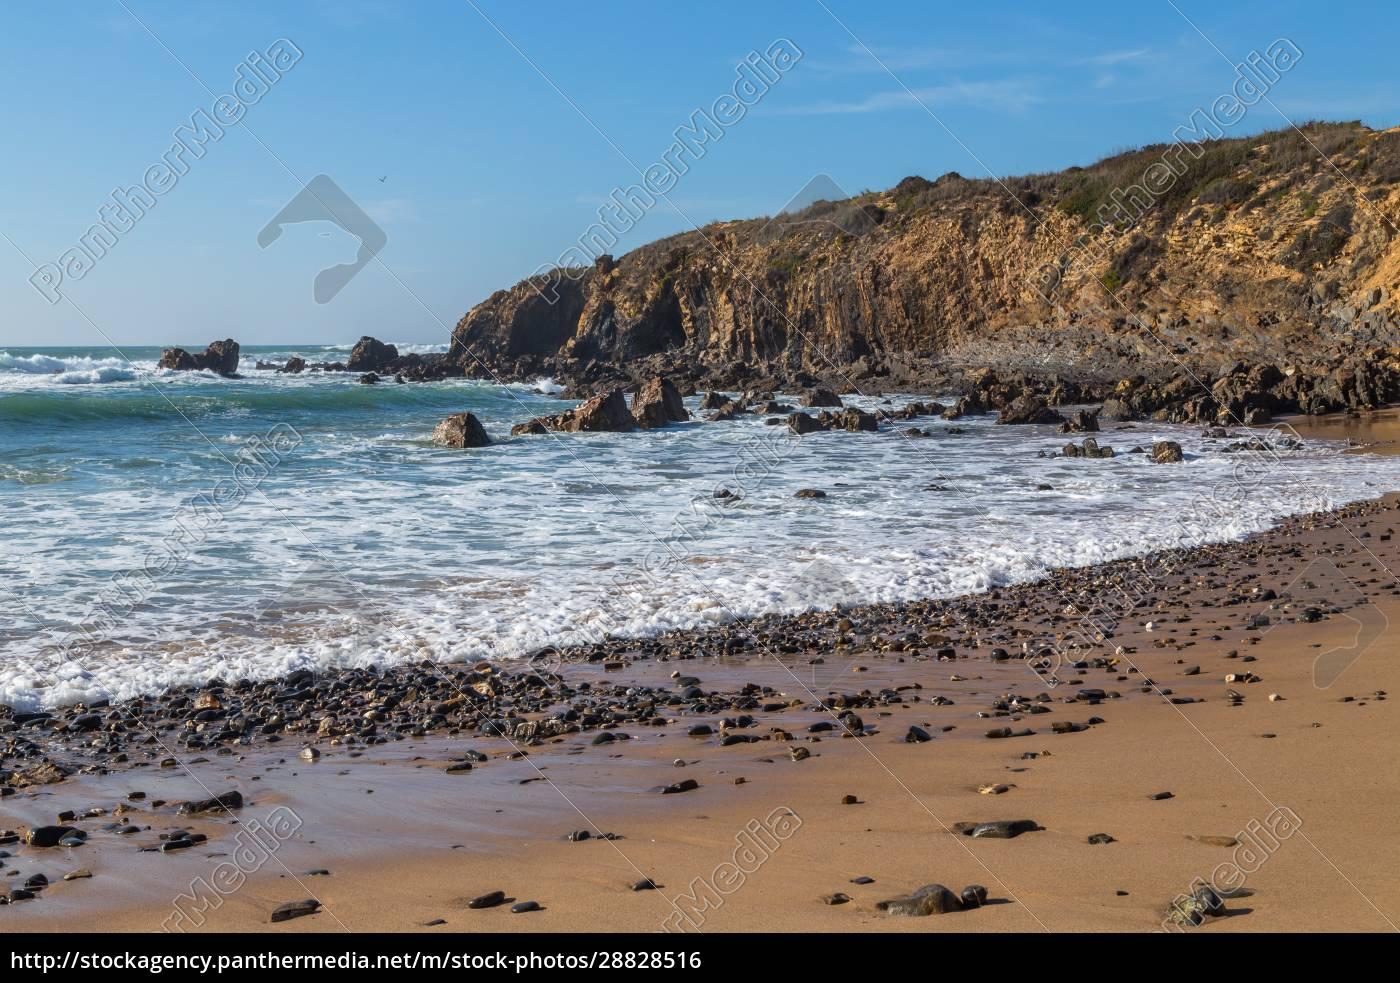 atlantic, isolated, beach - 28828516